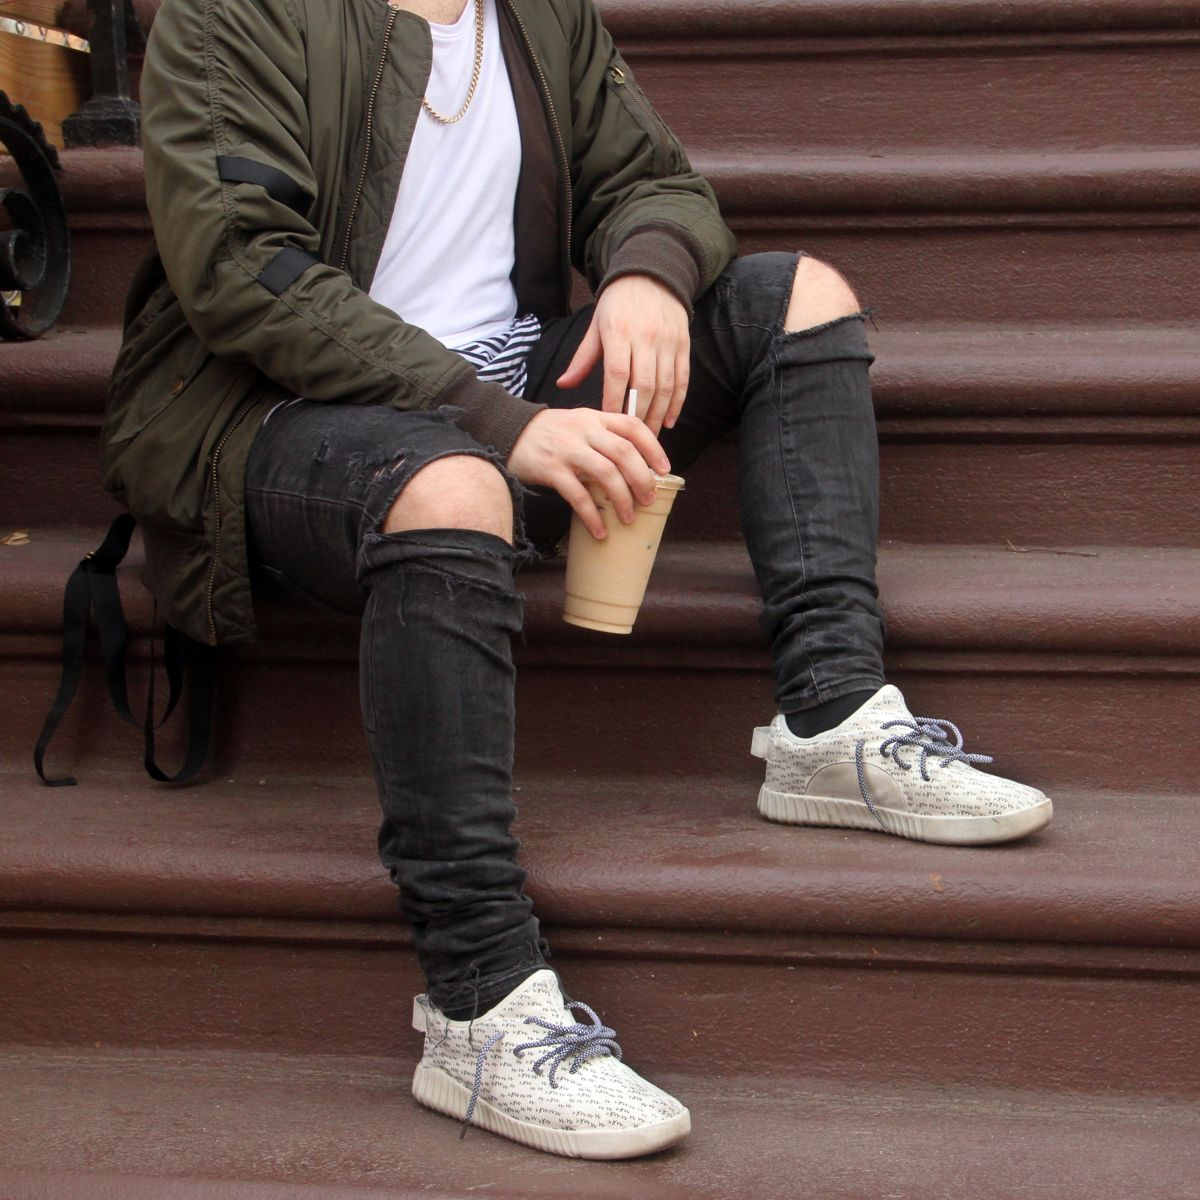 how wearing fake sneakers